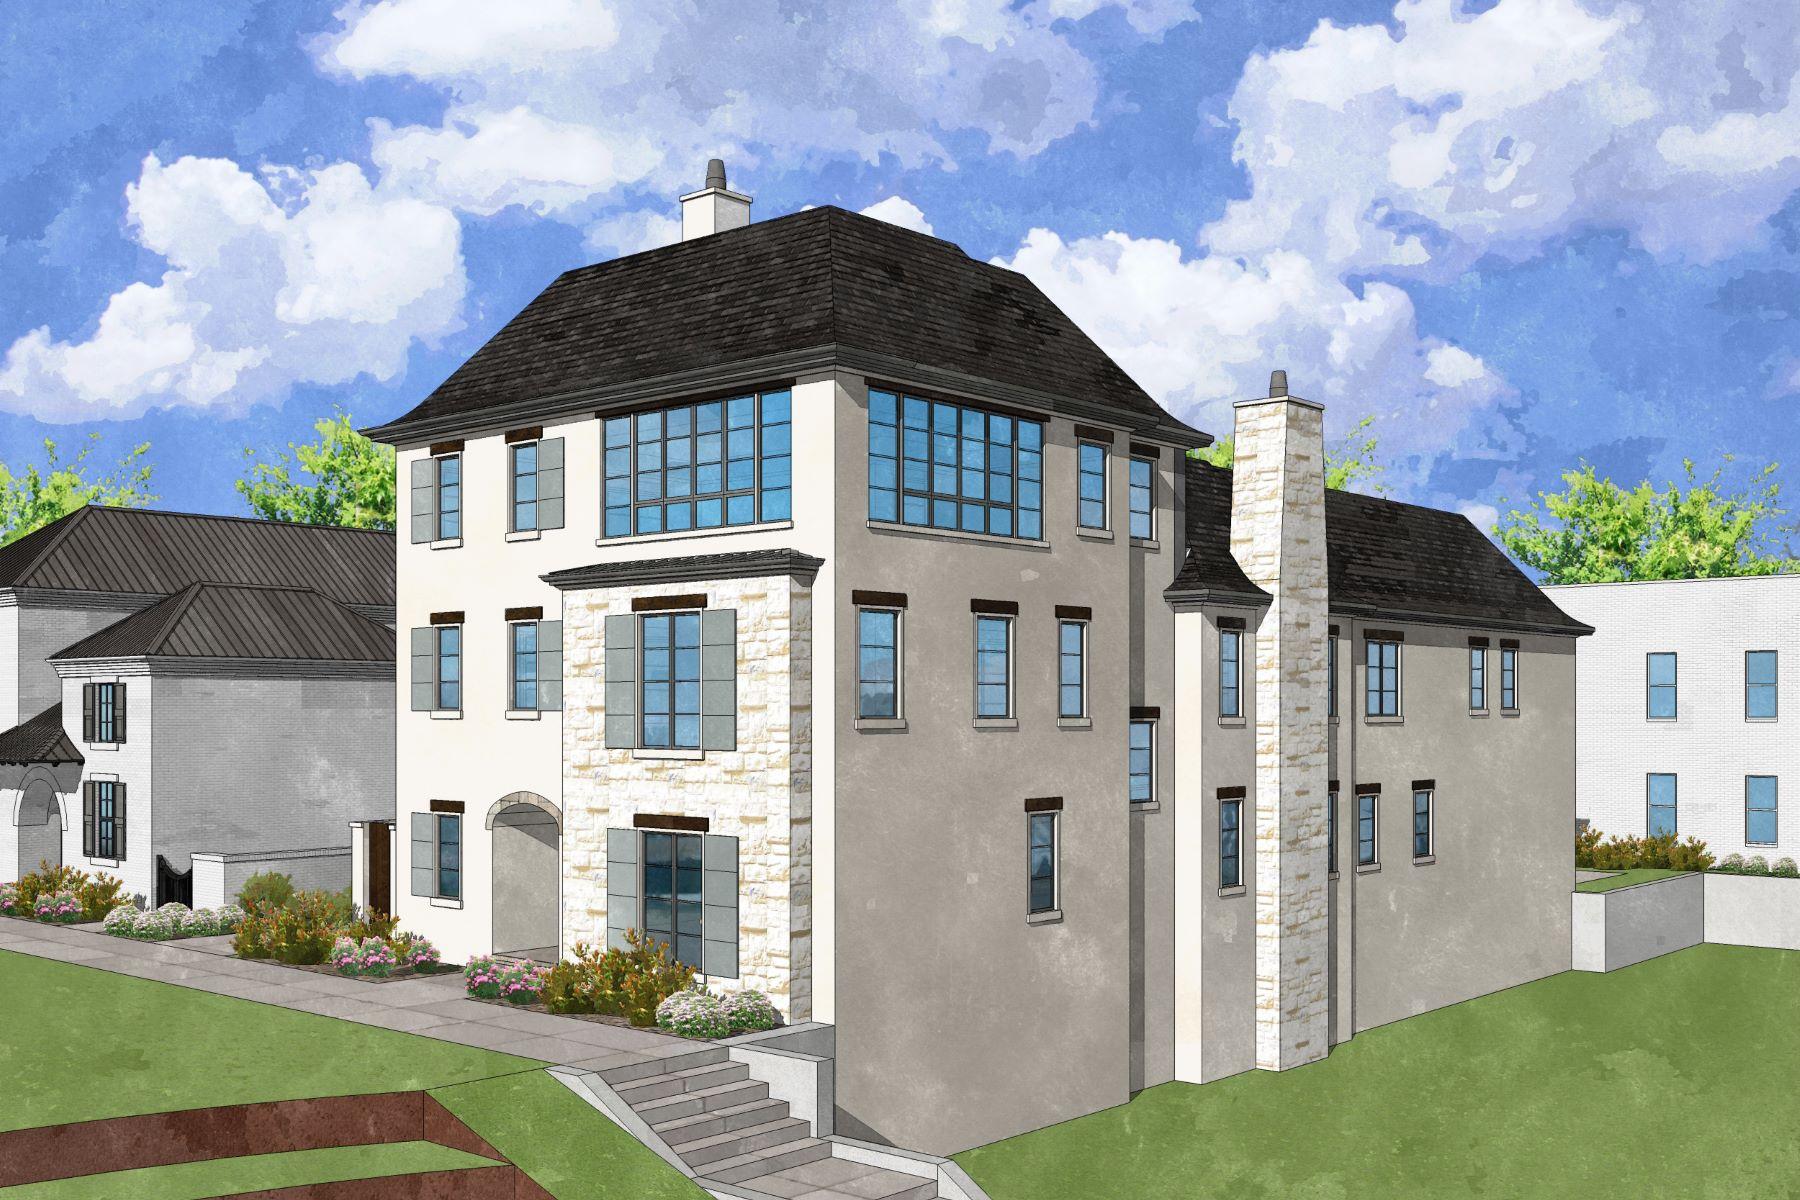 Casa unifamiliar adosada (Townhouse) por un Venta en New Construction Townhome 217 N Esplanade Alpharetta, Georgia, 30009 Estados Unidos